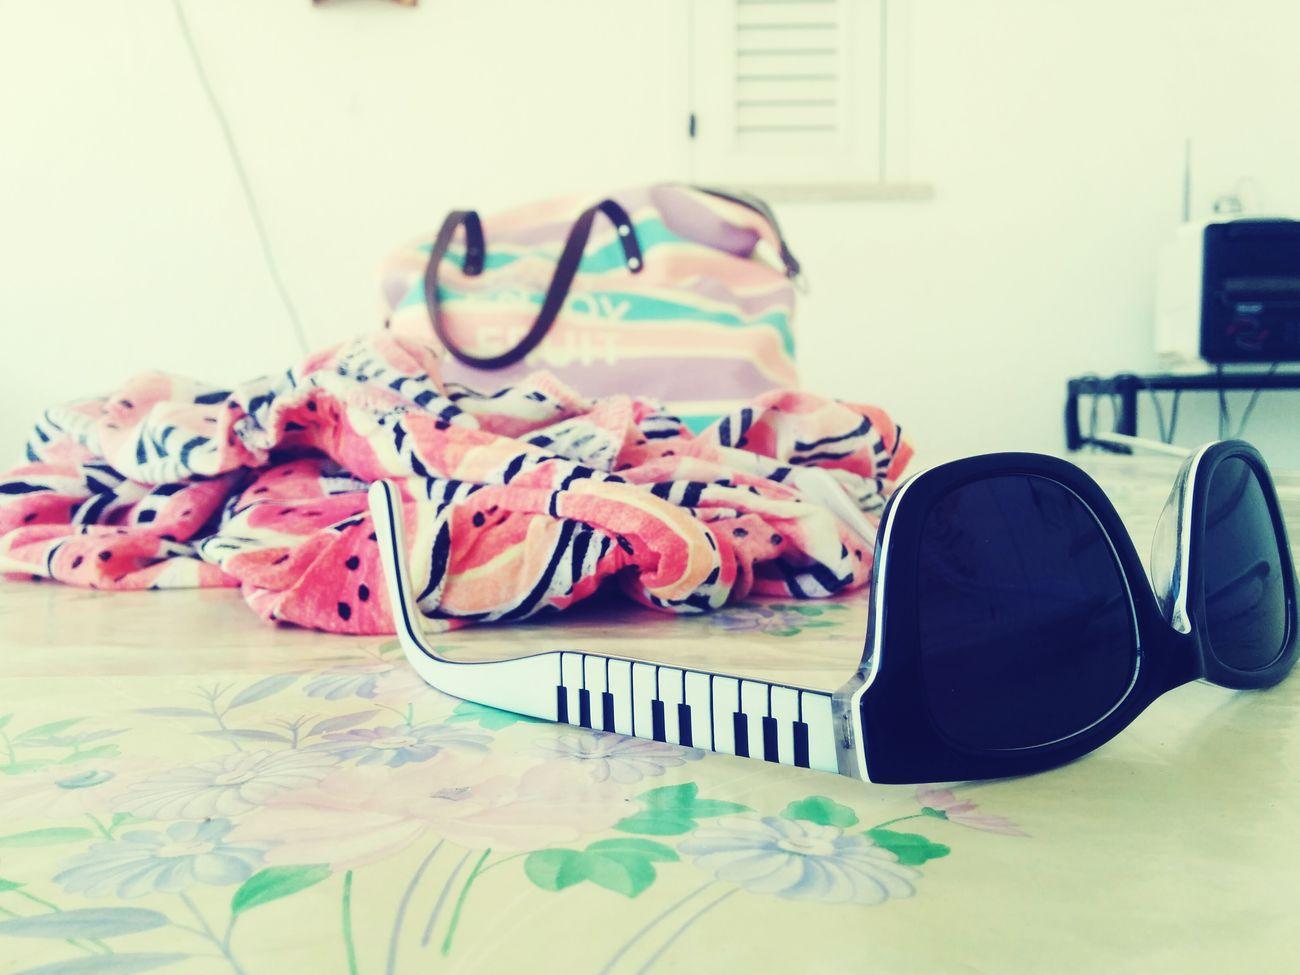 Memories Ricordi Summer Estate2015 Summerbags Sunglasses Watermelon🍉 Anguria Winter Is Coming